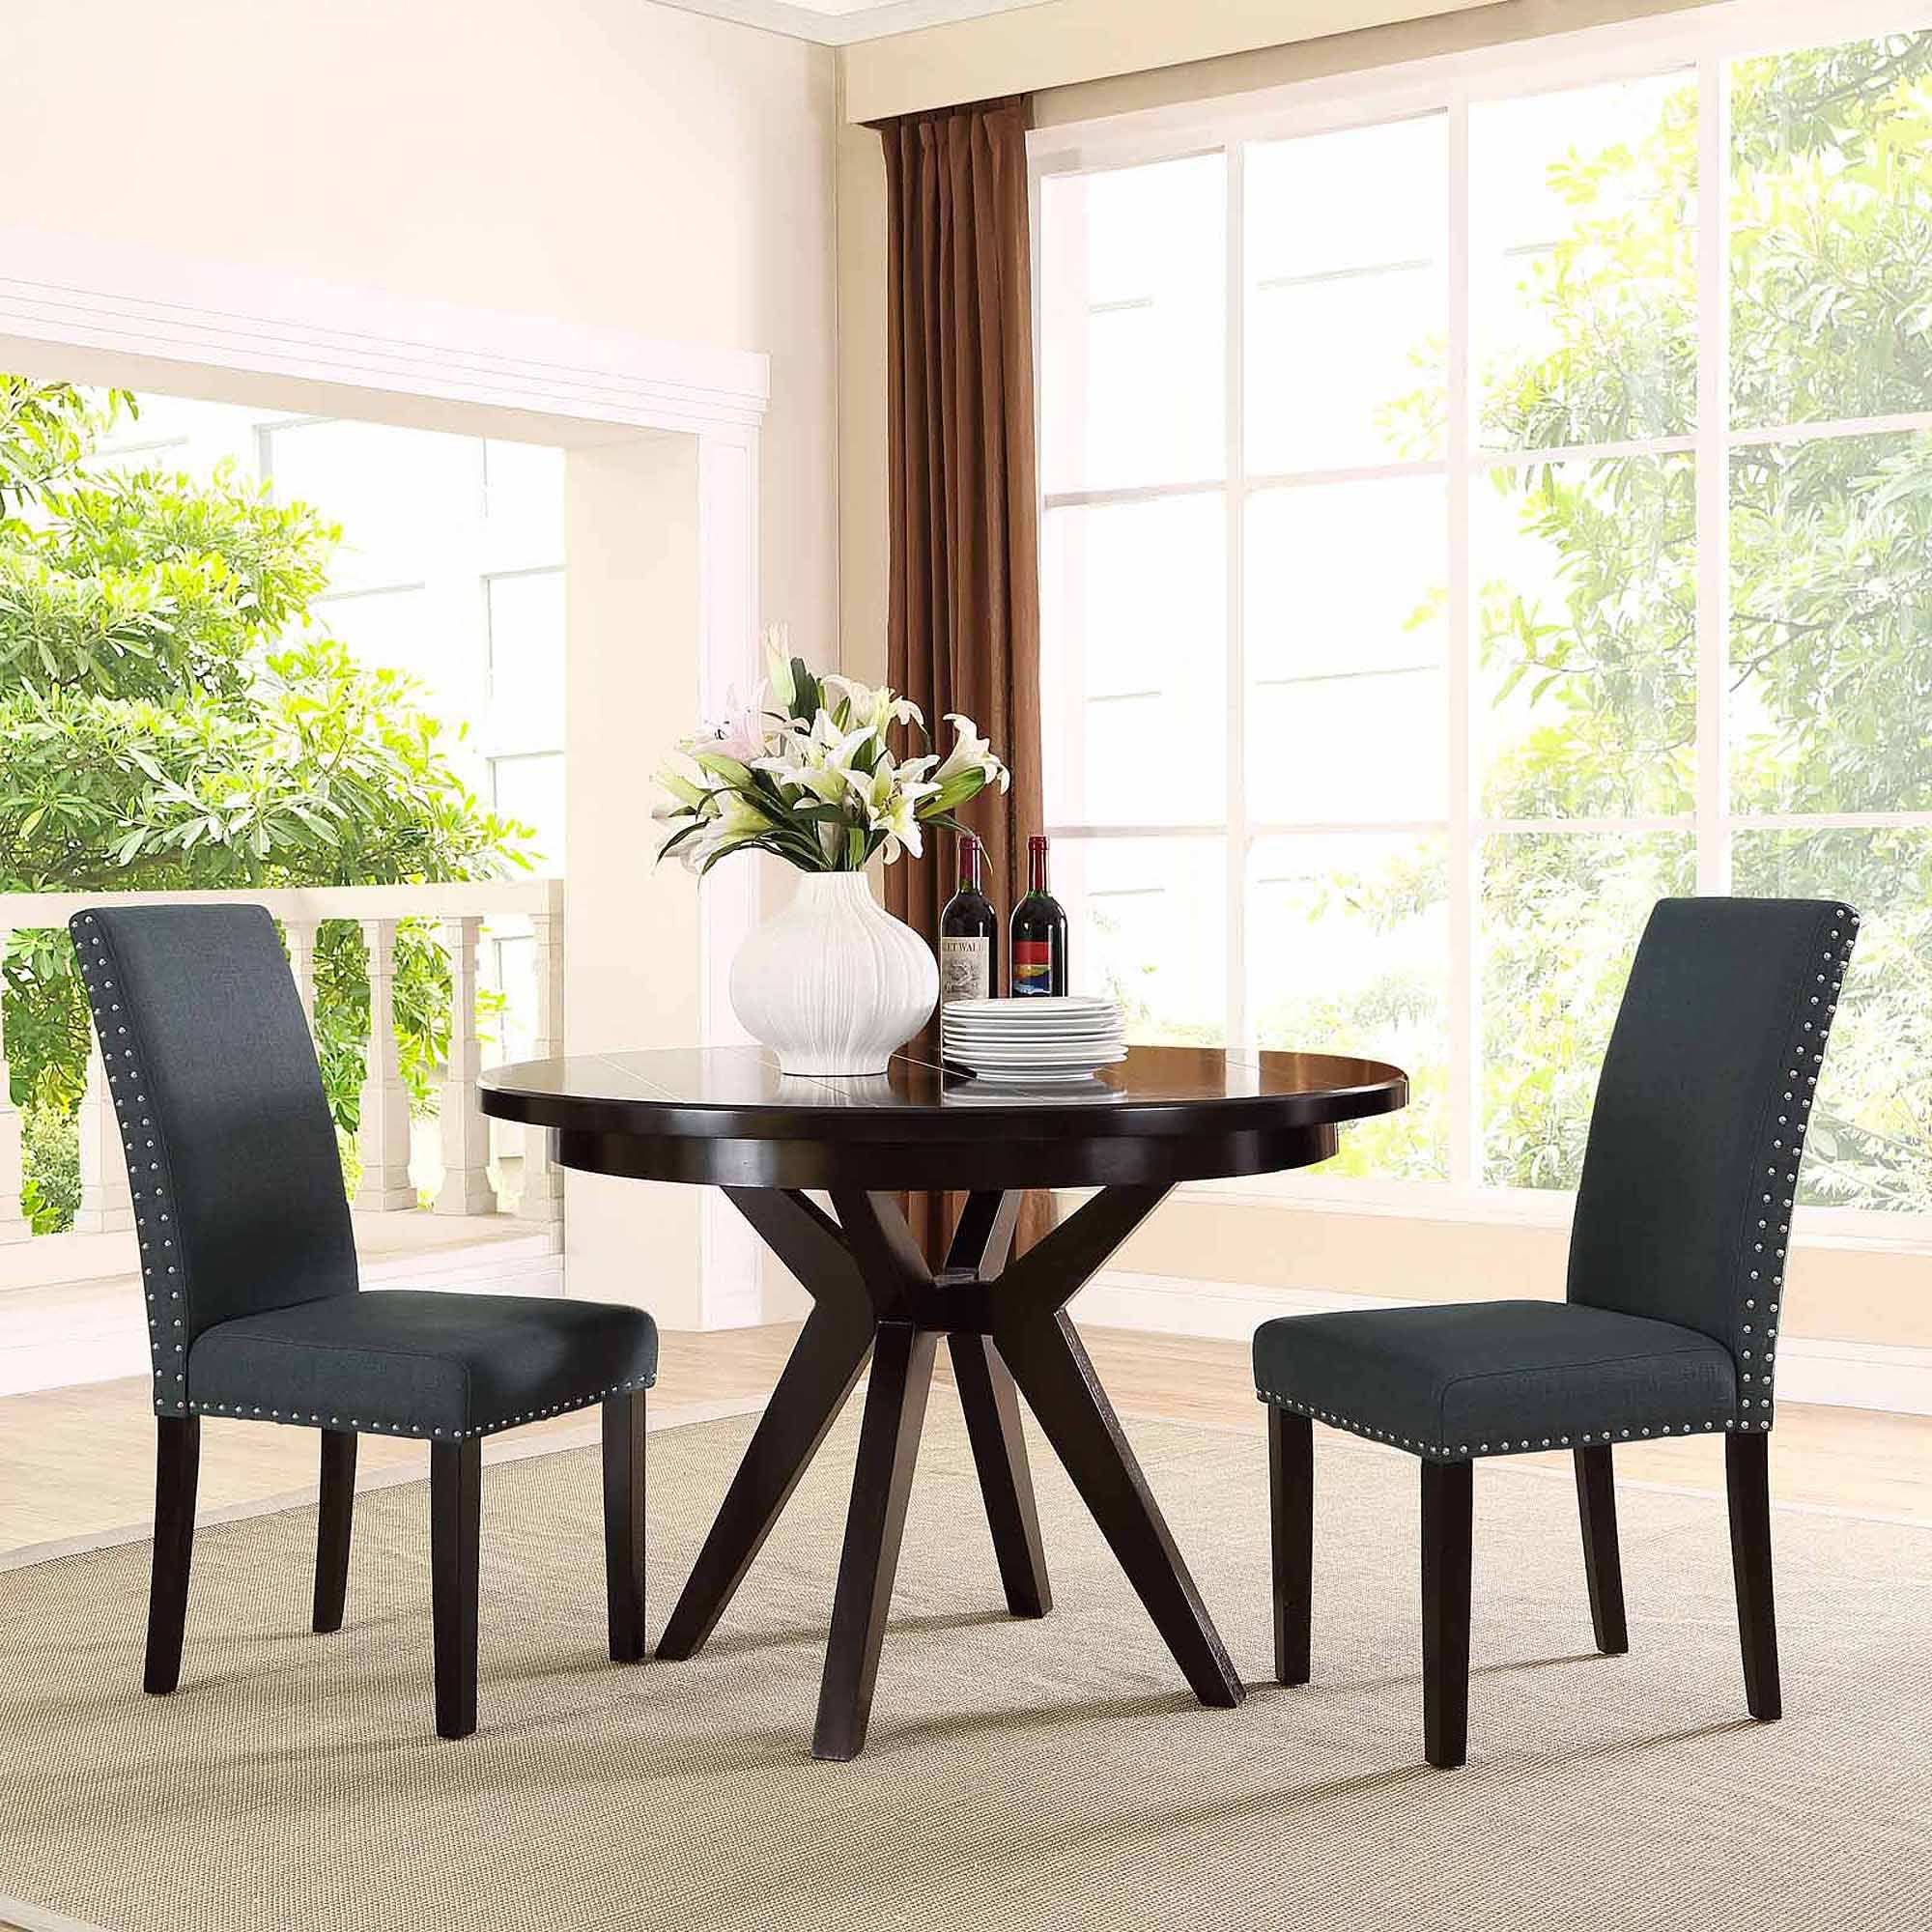 modway parcel upholstered dining side chair multiple colors rh pinterest com